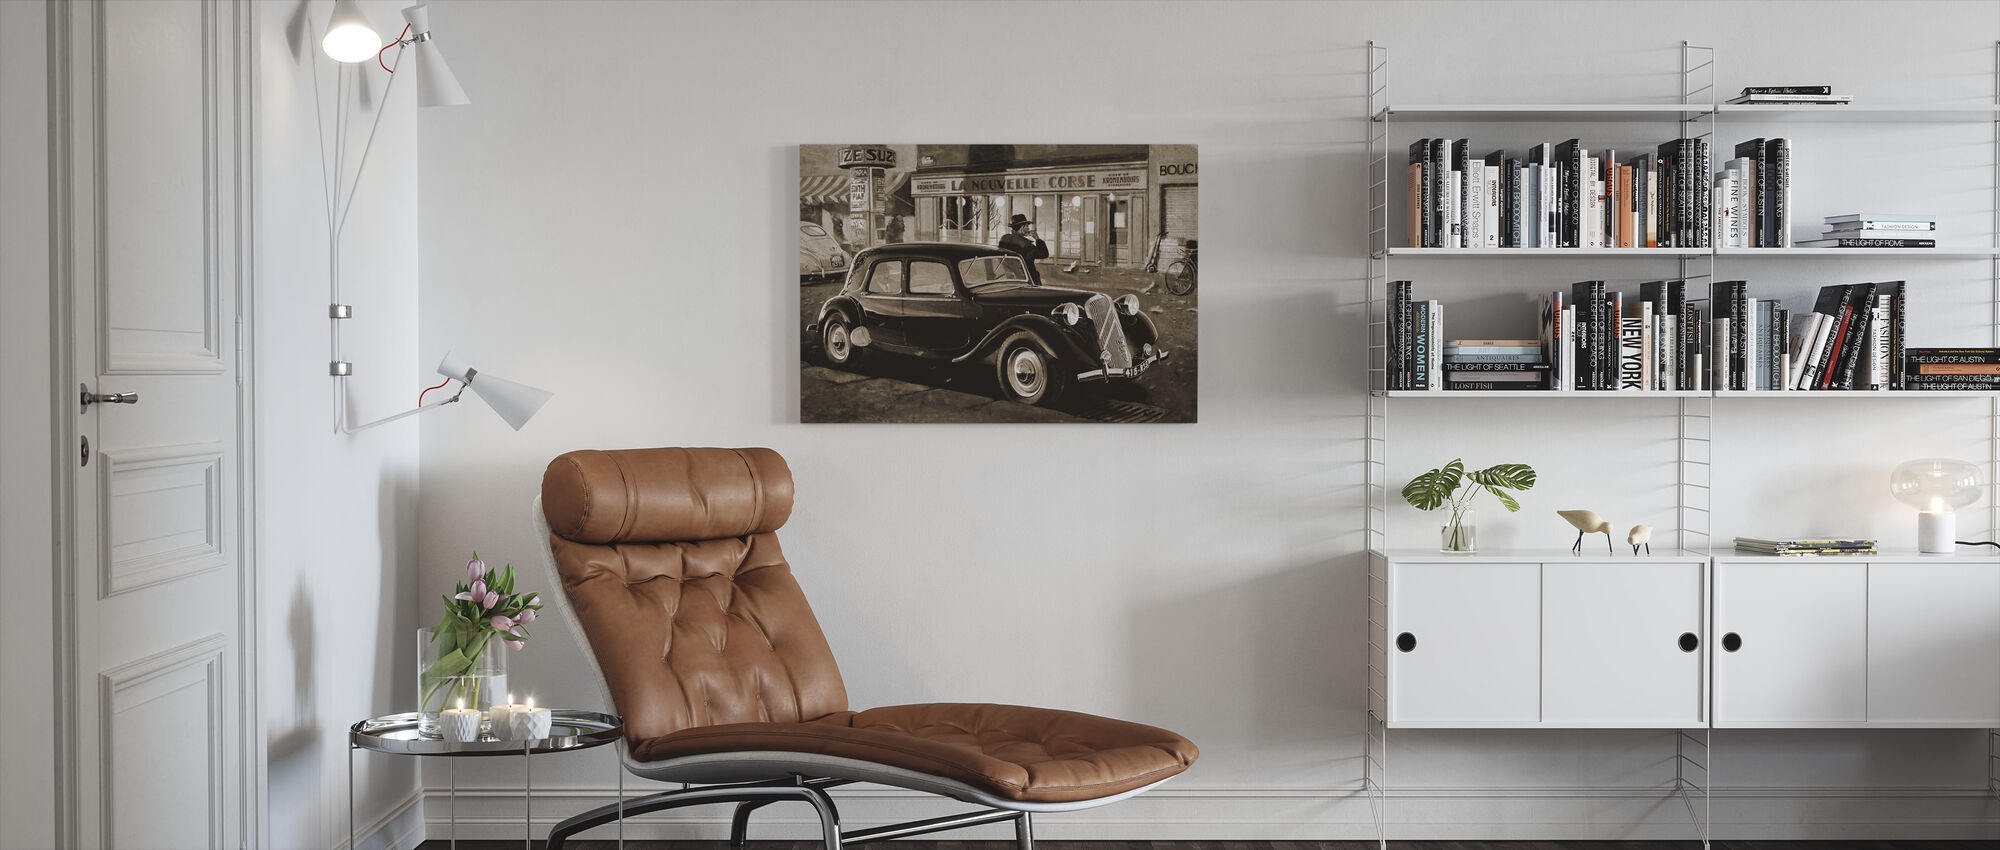 B15 in Paris Sepia - Canvas print - Living Room